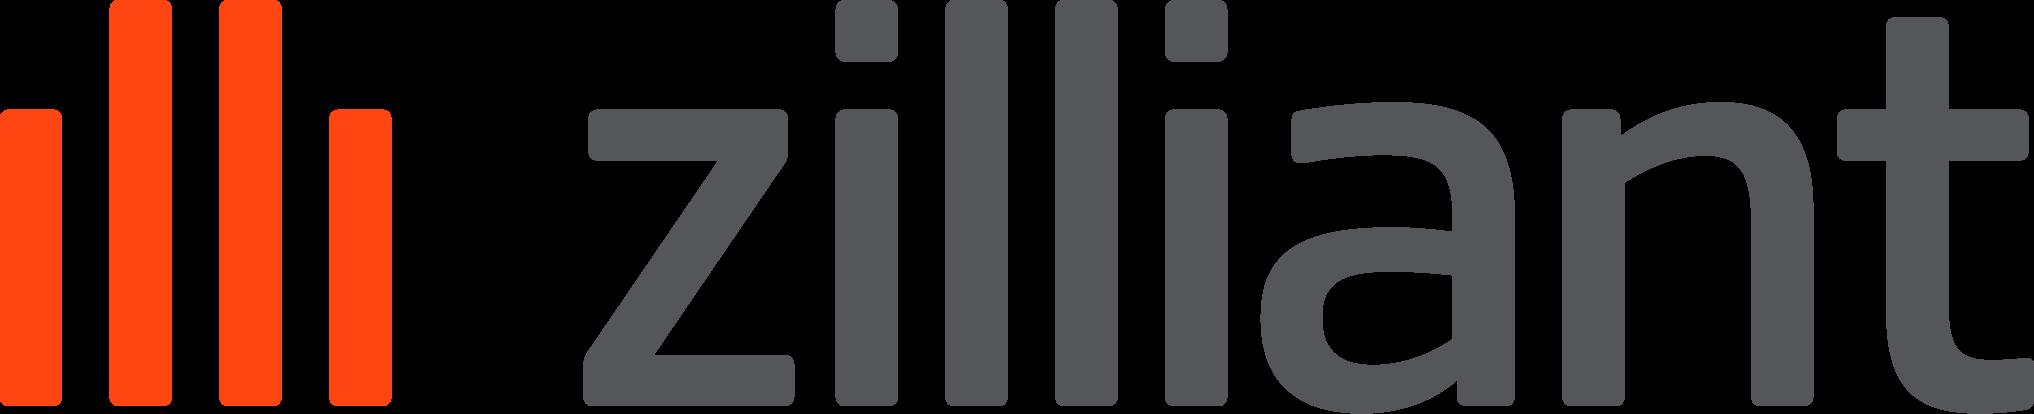 sales-gps-sponsors-zilliant.png